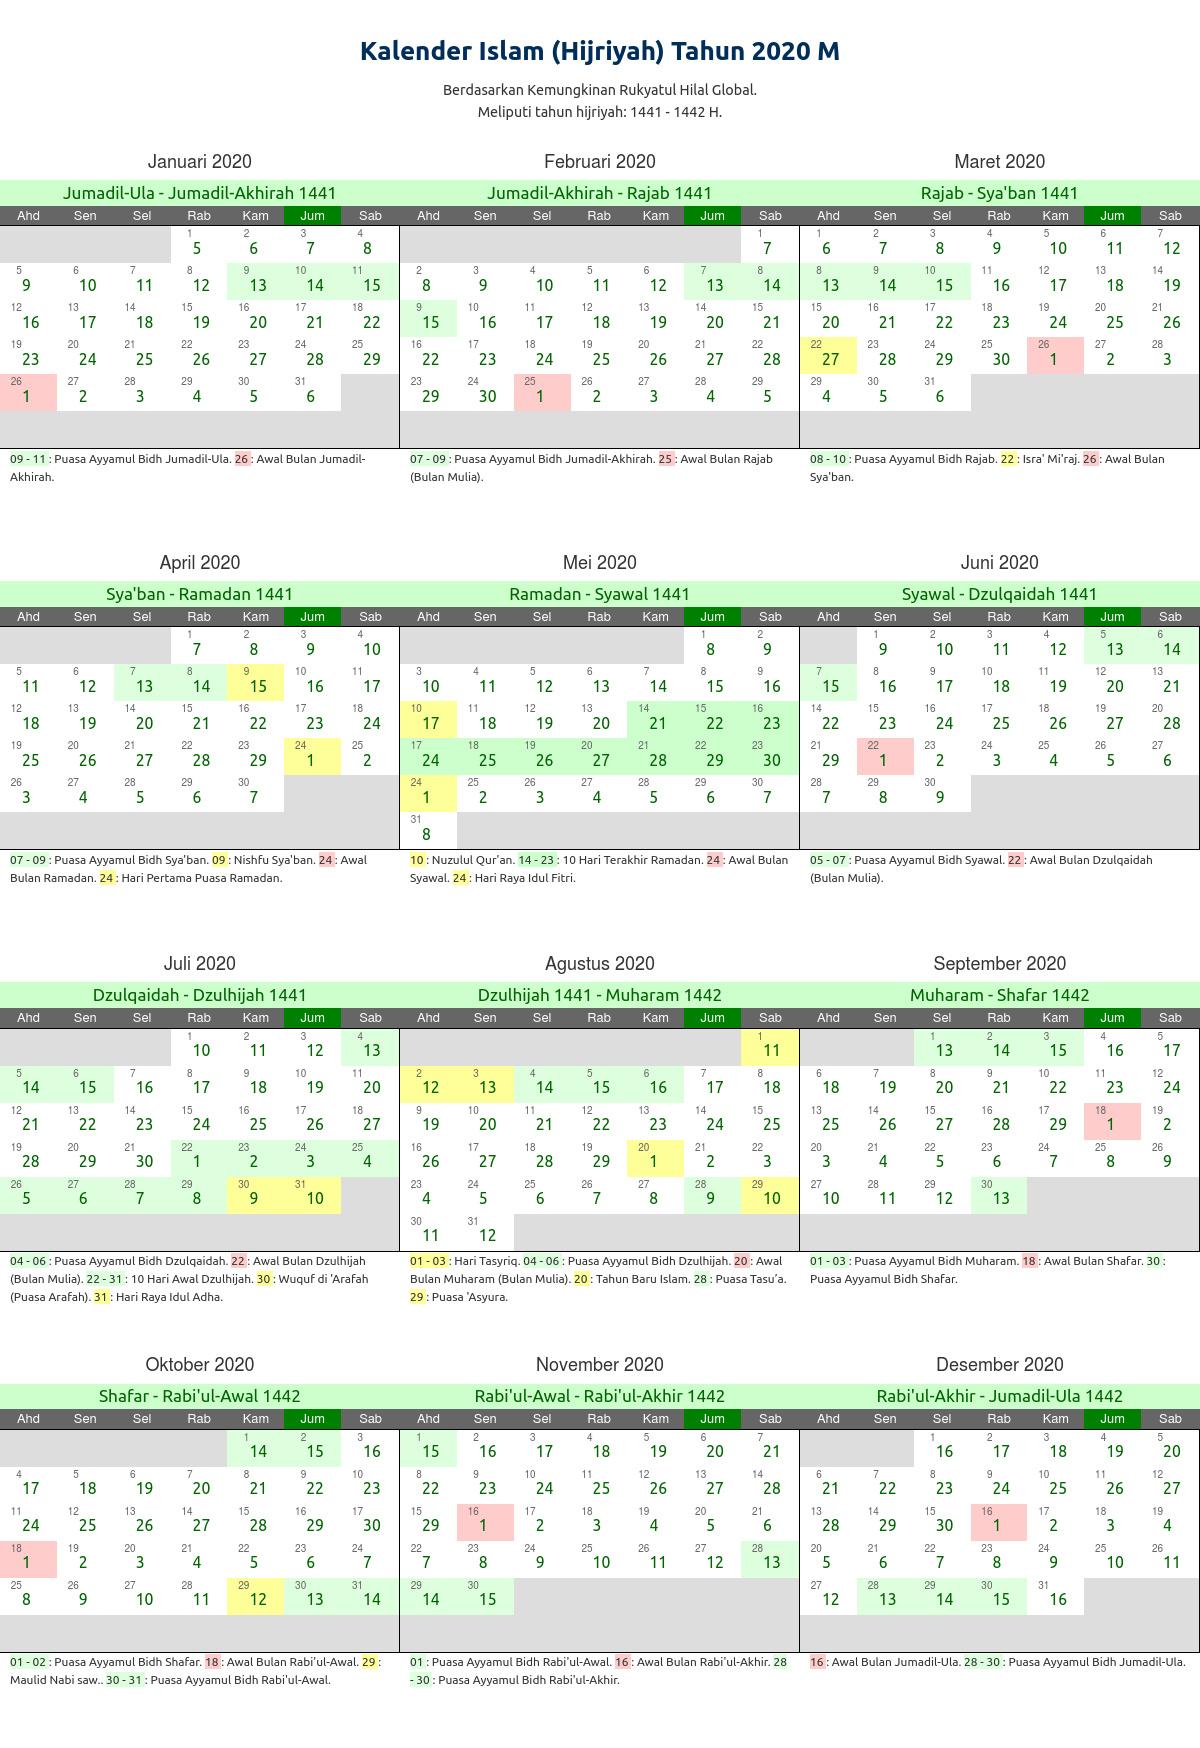 Puasa Syaban 2020 Jatuh Pada Tanggal : puasa, syaban, jatuh, tanggal, Pembaruan:, Kalender, Islam, Tahunan, Dengan, Tanggal-tanggal, Penting, Alhabib